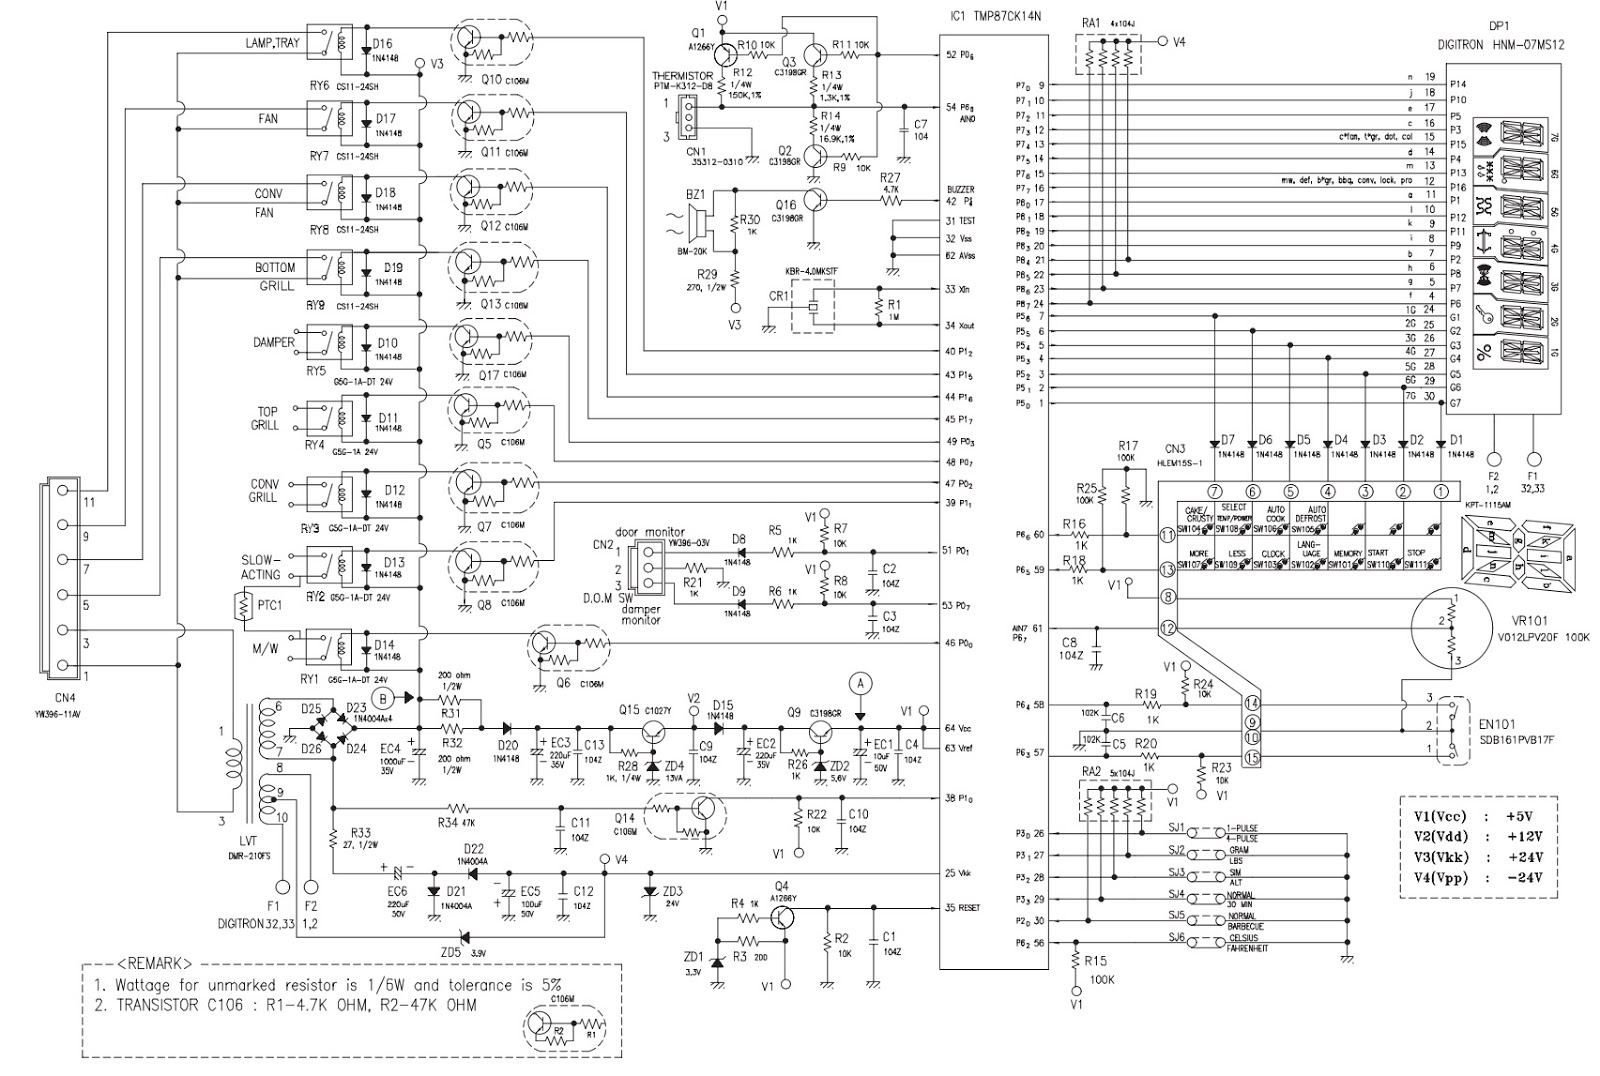 Toshiba 1600 Xp Wiring Diagram Modern Design Of Dacor Diagrams 9 Lead Motor Hp